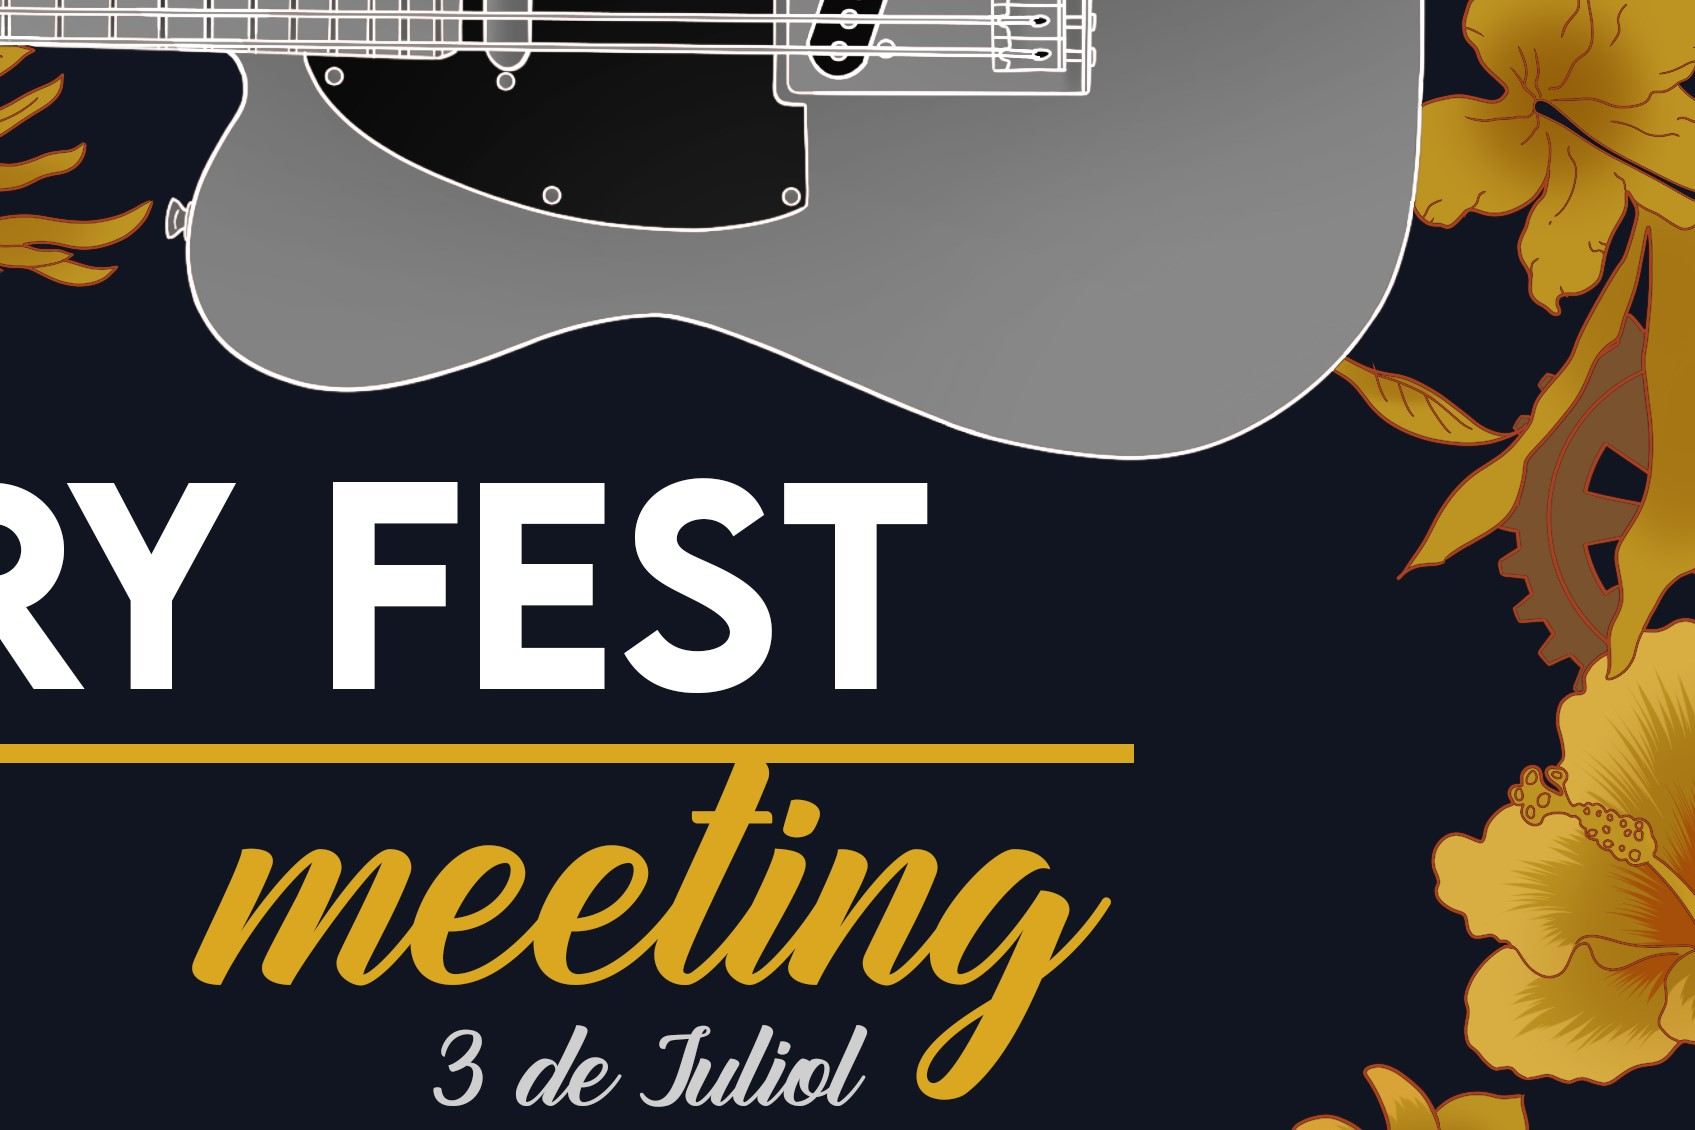 Factory Fest Meeting